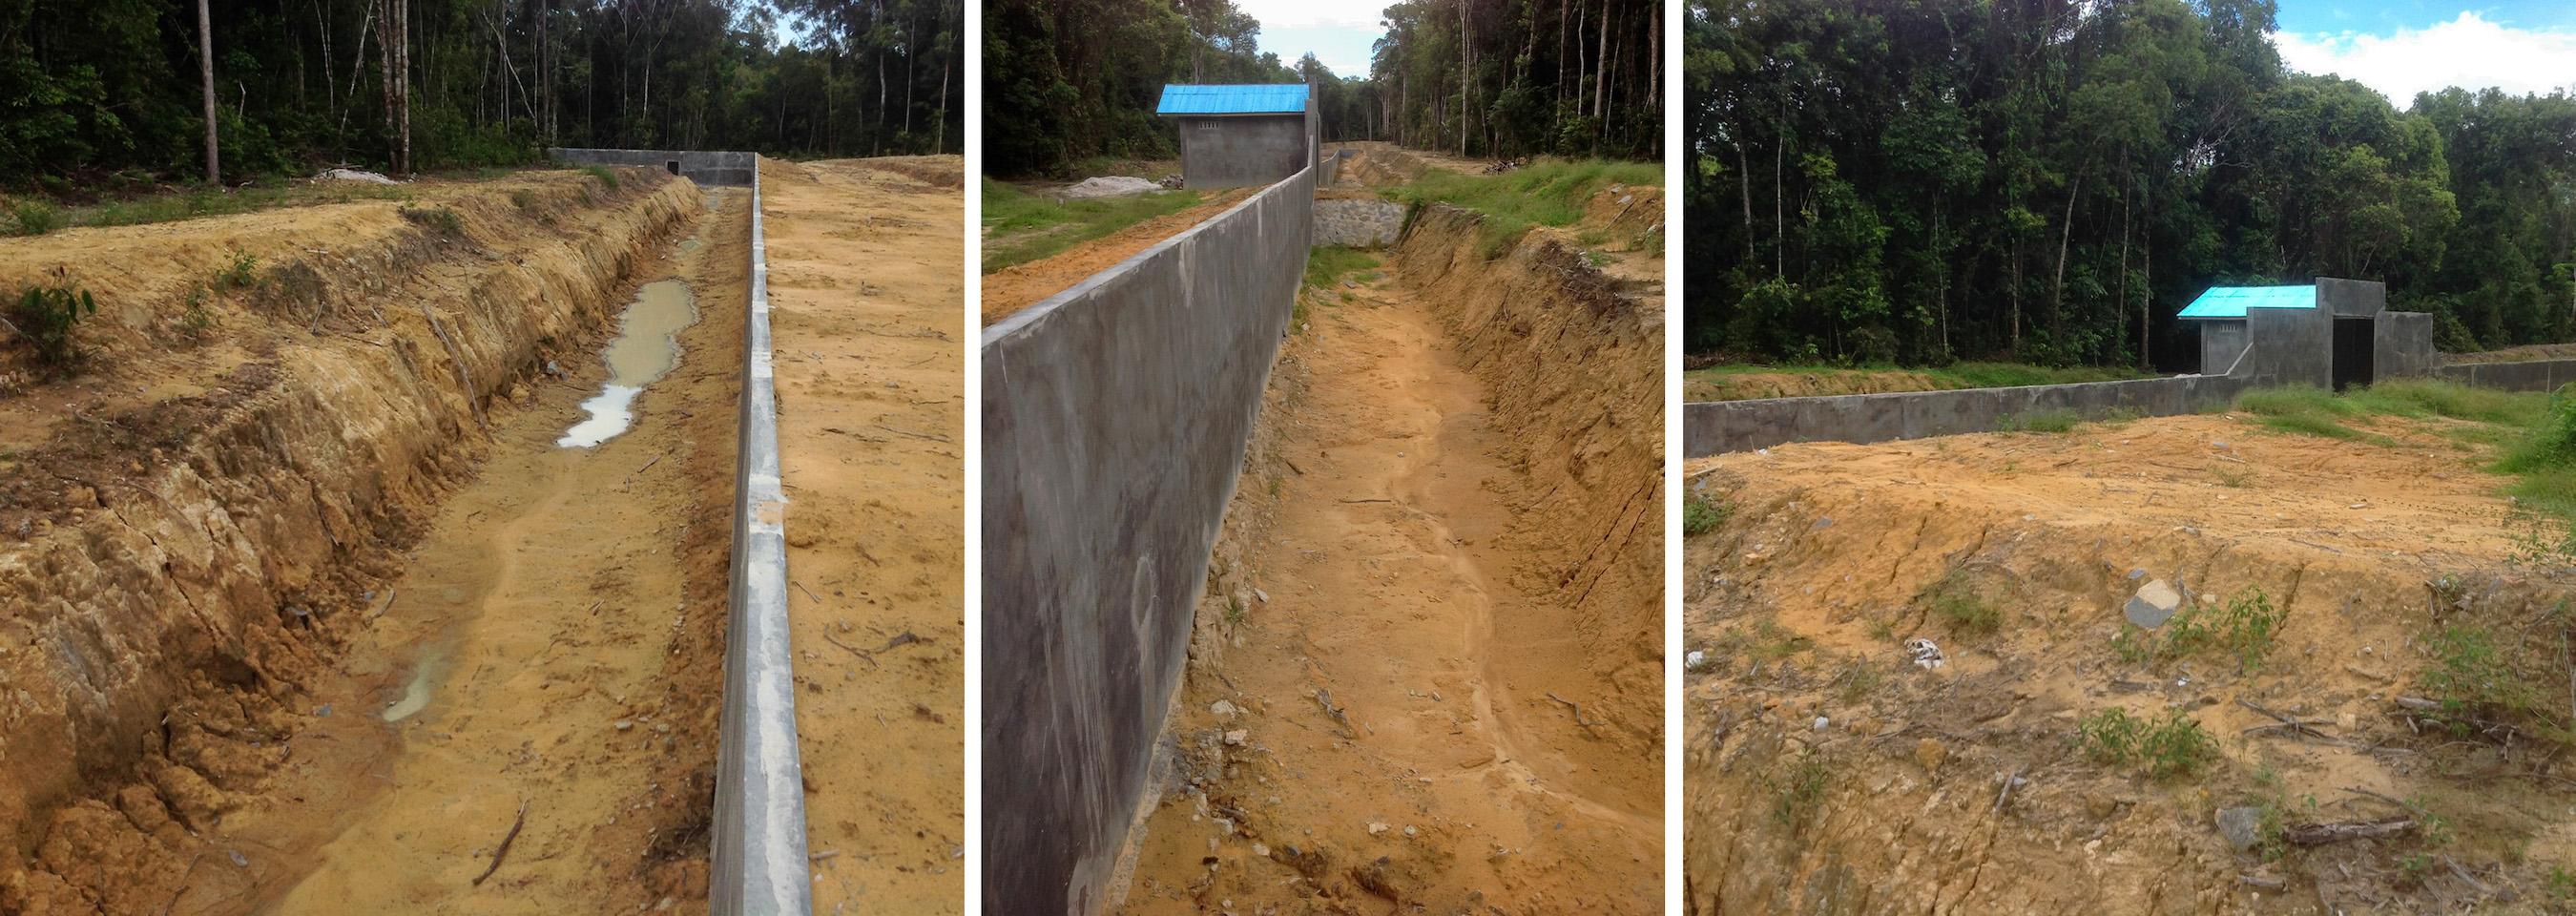 2nd Haha Construction Work